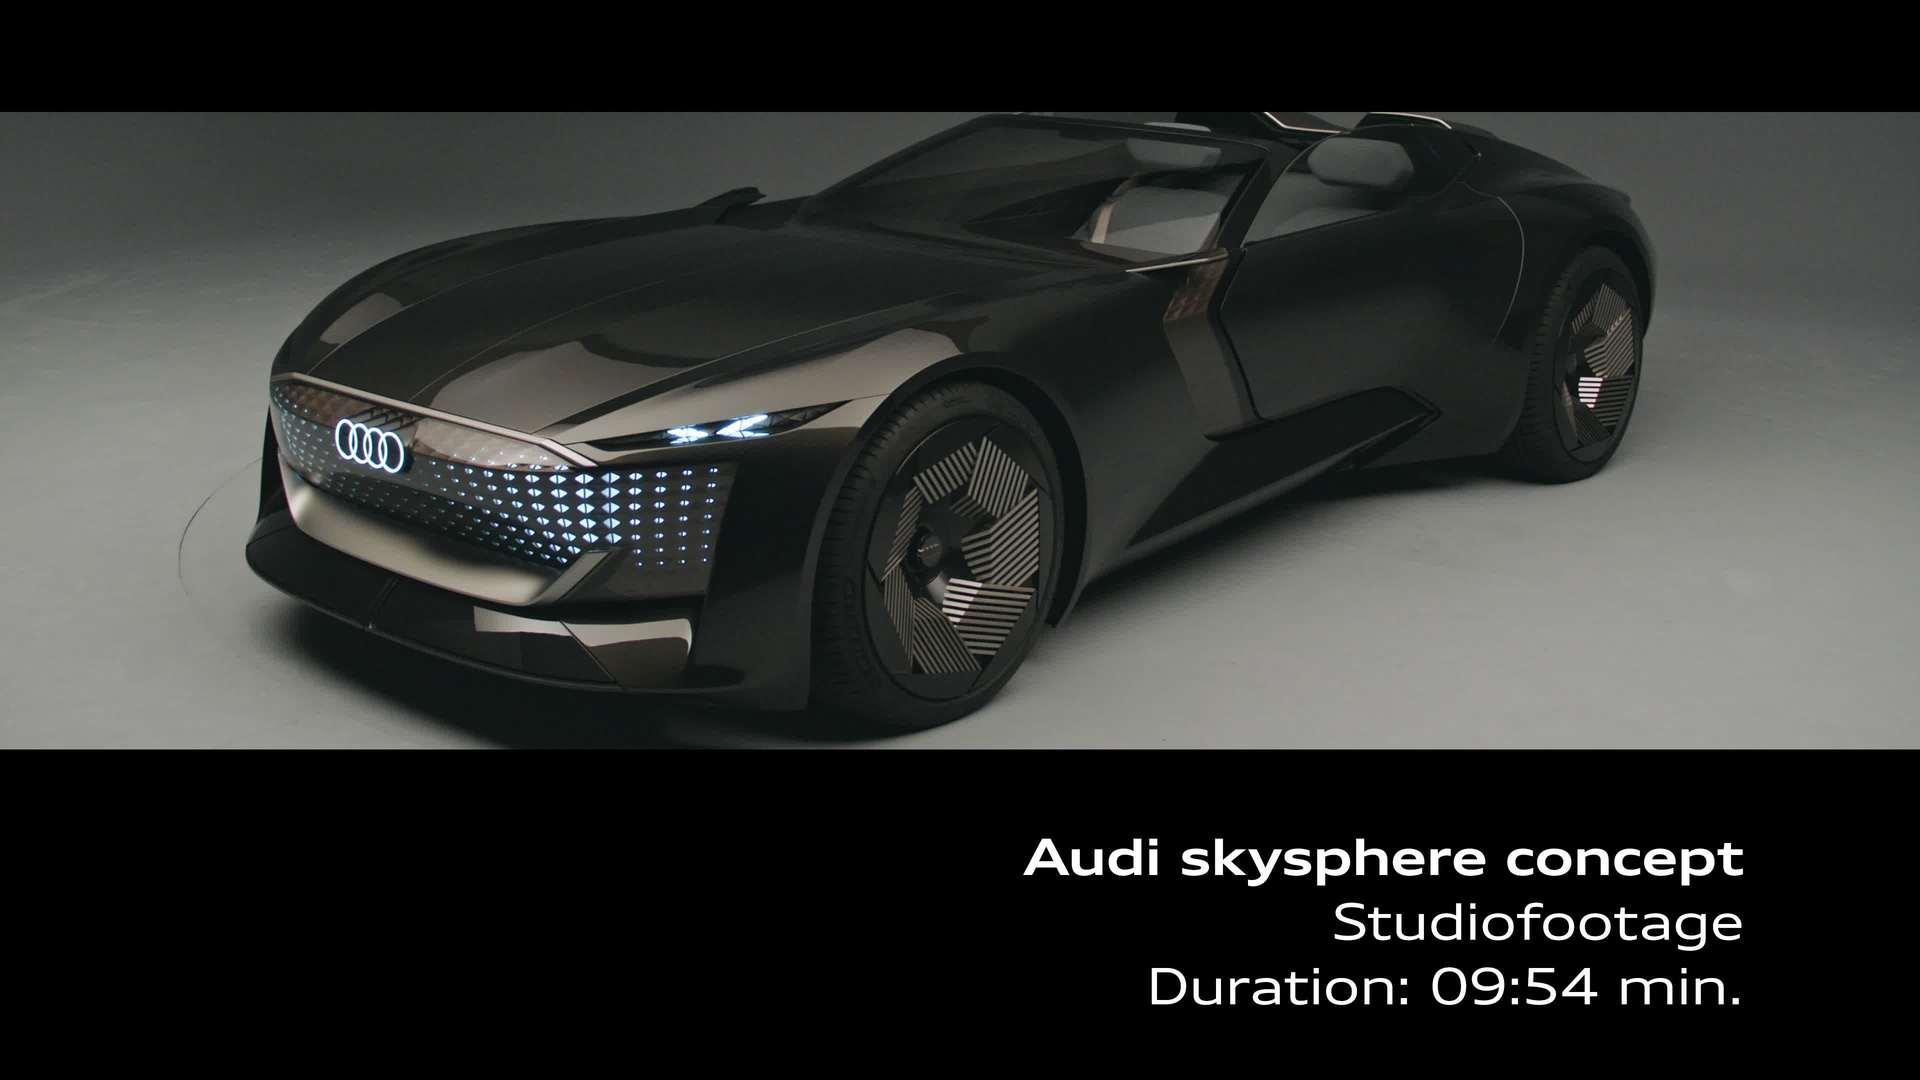 Footage: Audi skysphere concept im Studio